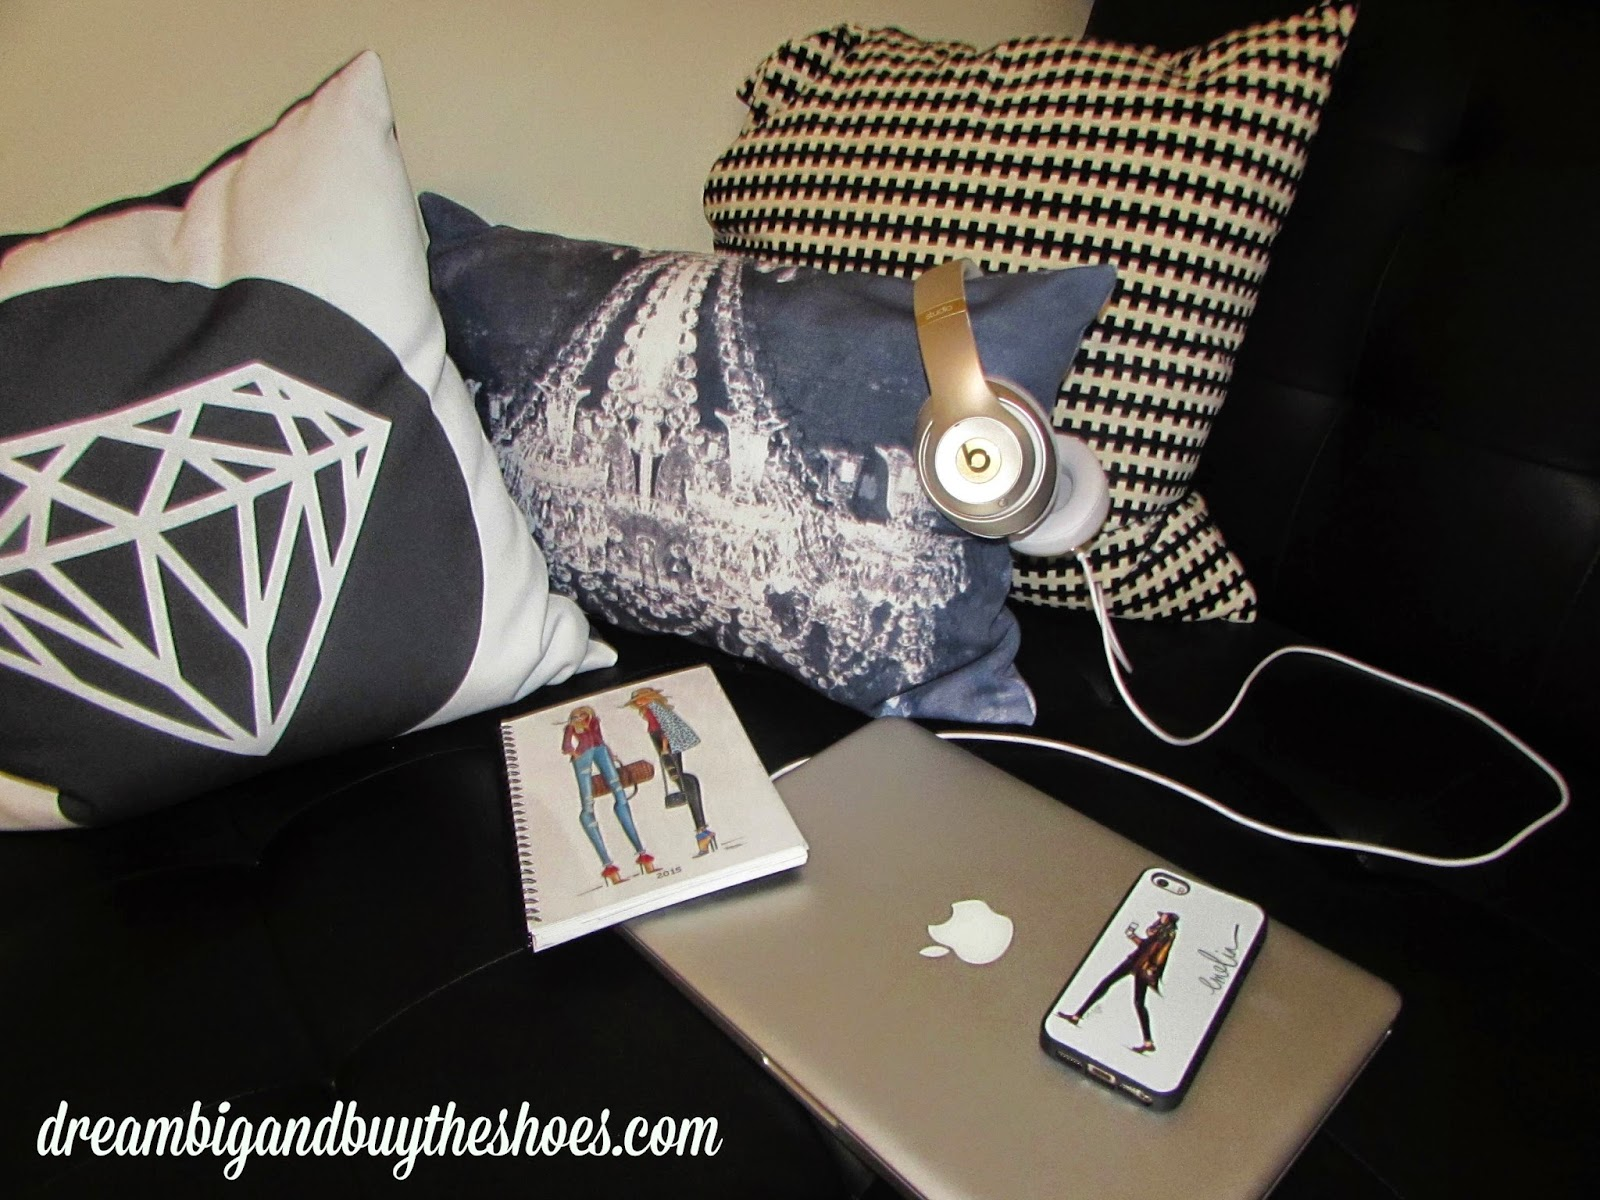 home blogging spaces